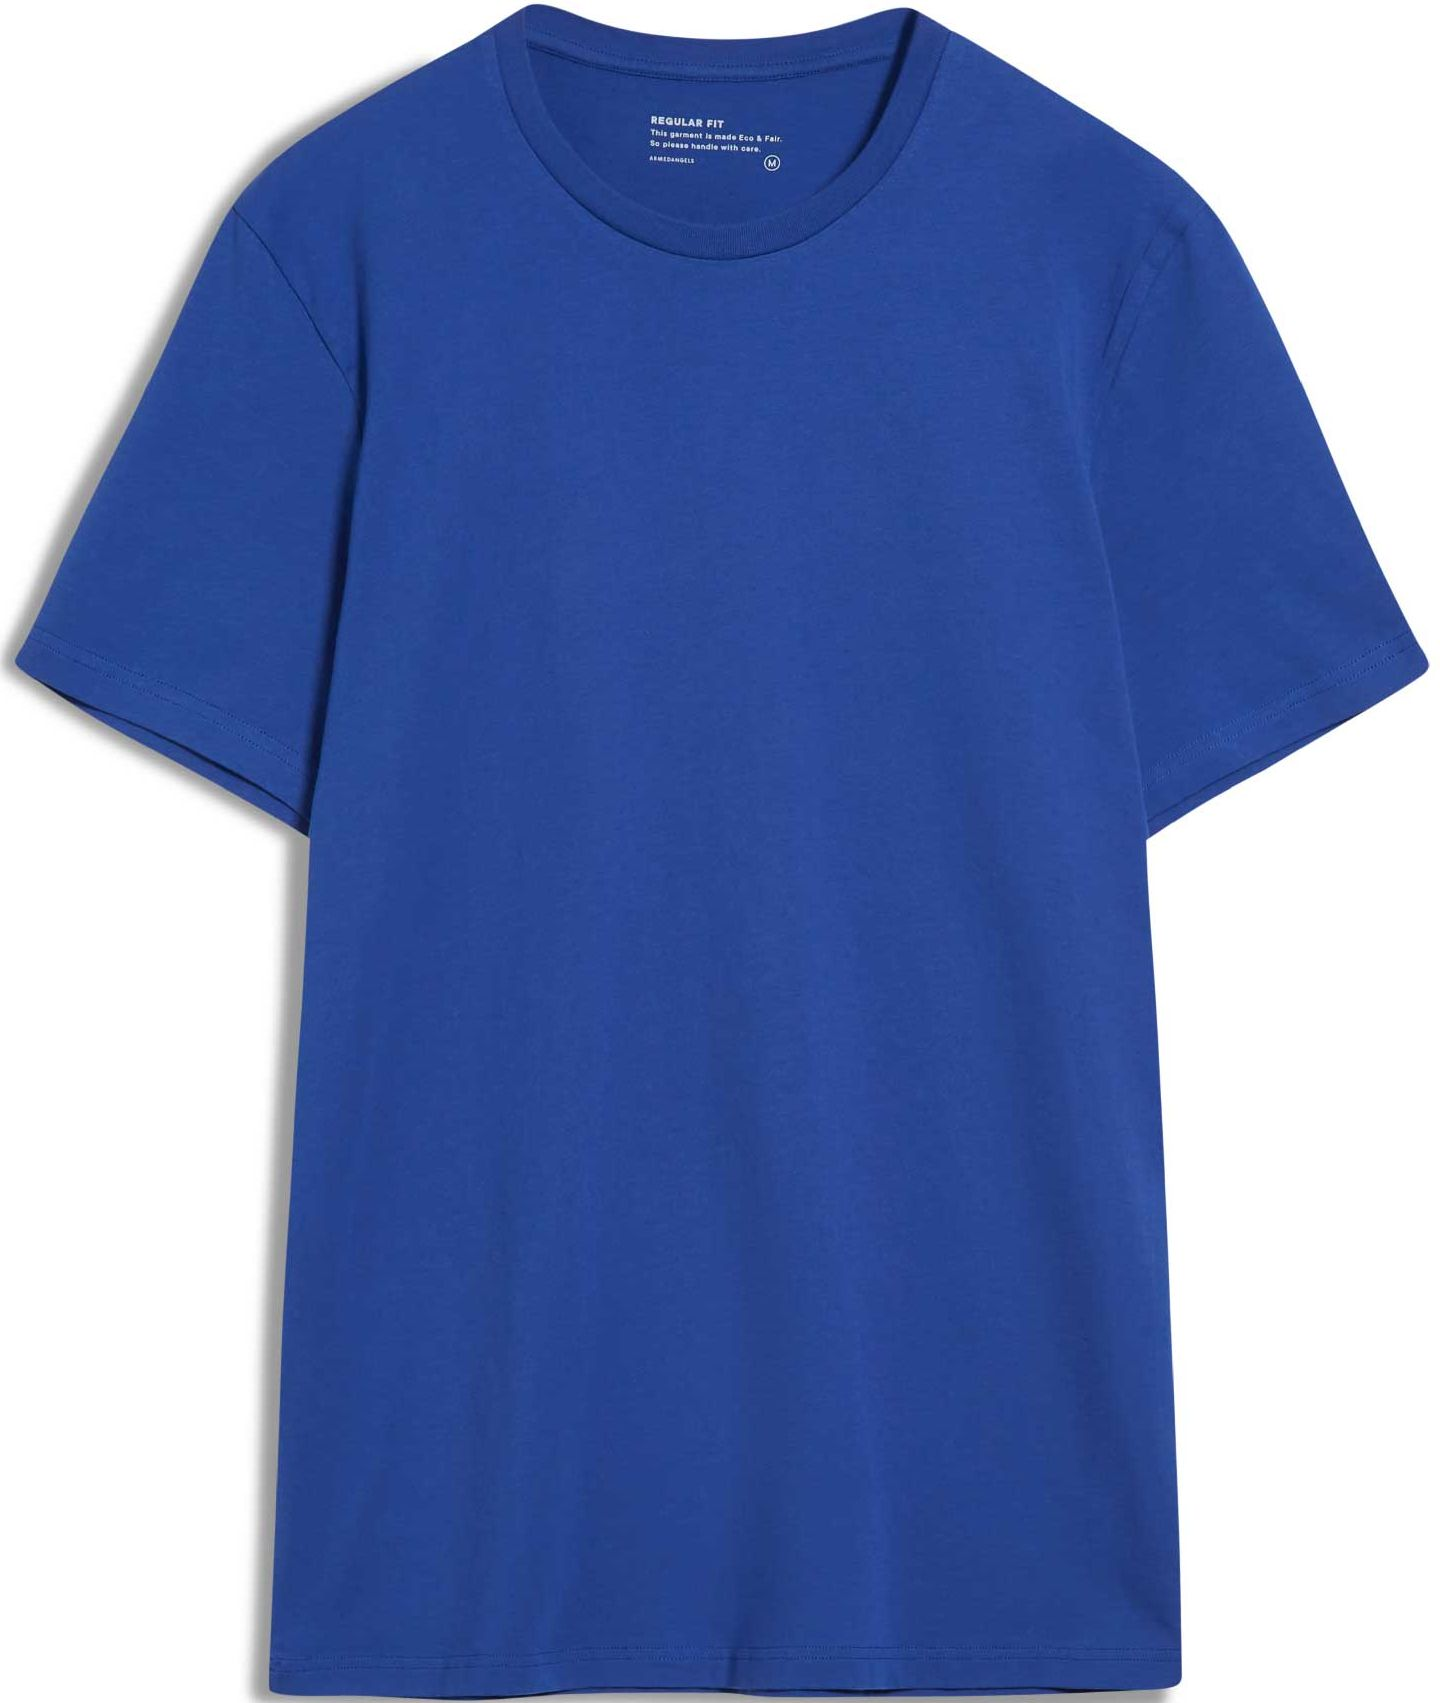 Basic Herren-Shirt JAAMES marazine blue